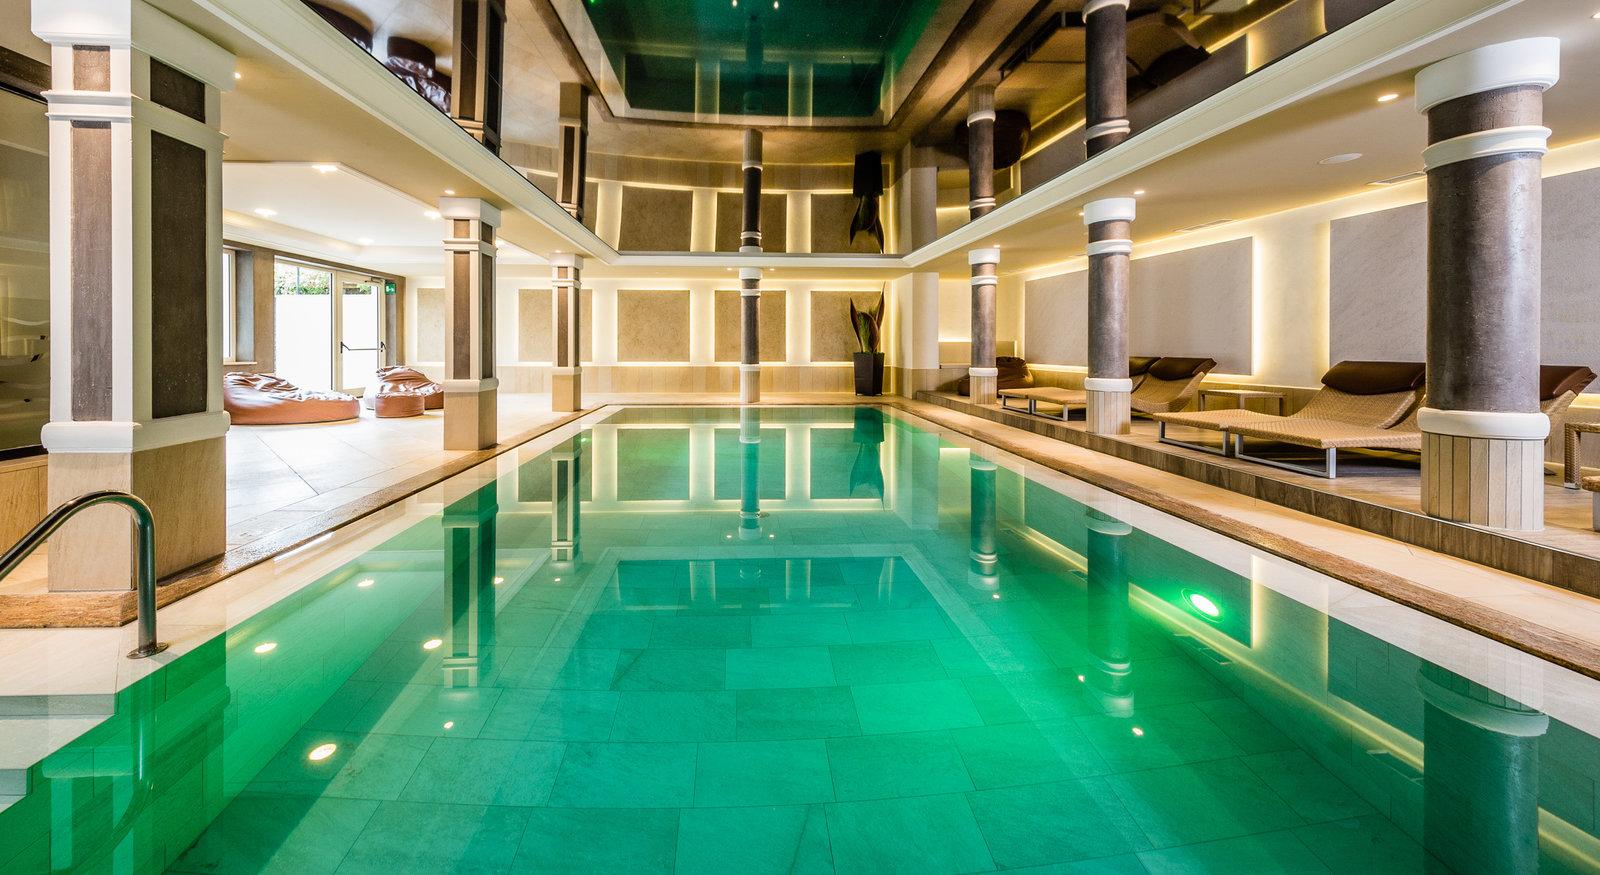 Hotel anderlahn in partschins 4 hotel bei meran - Hotel maranza con piscina coperta ...